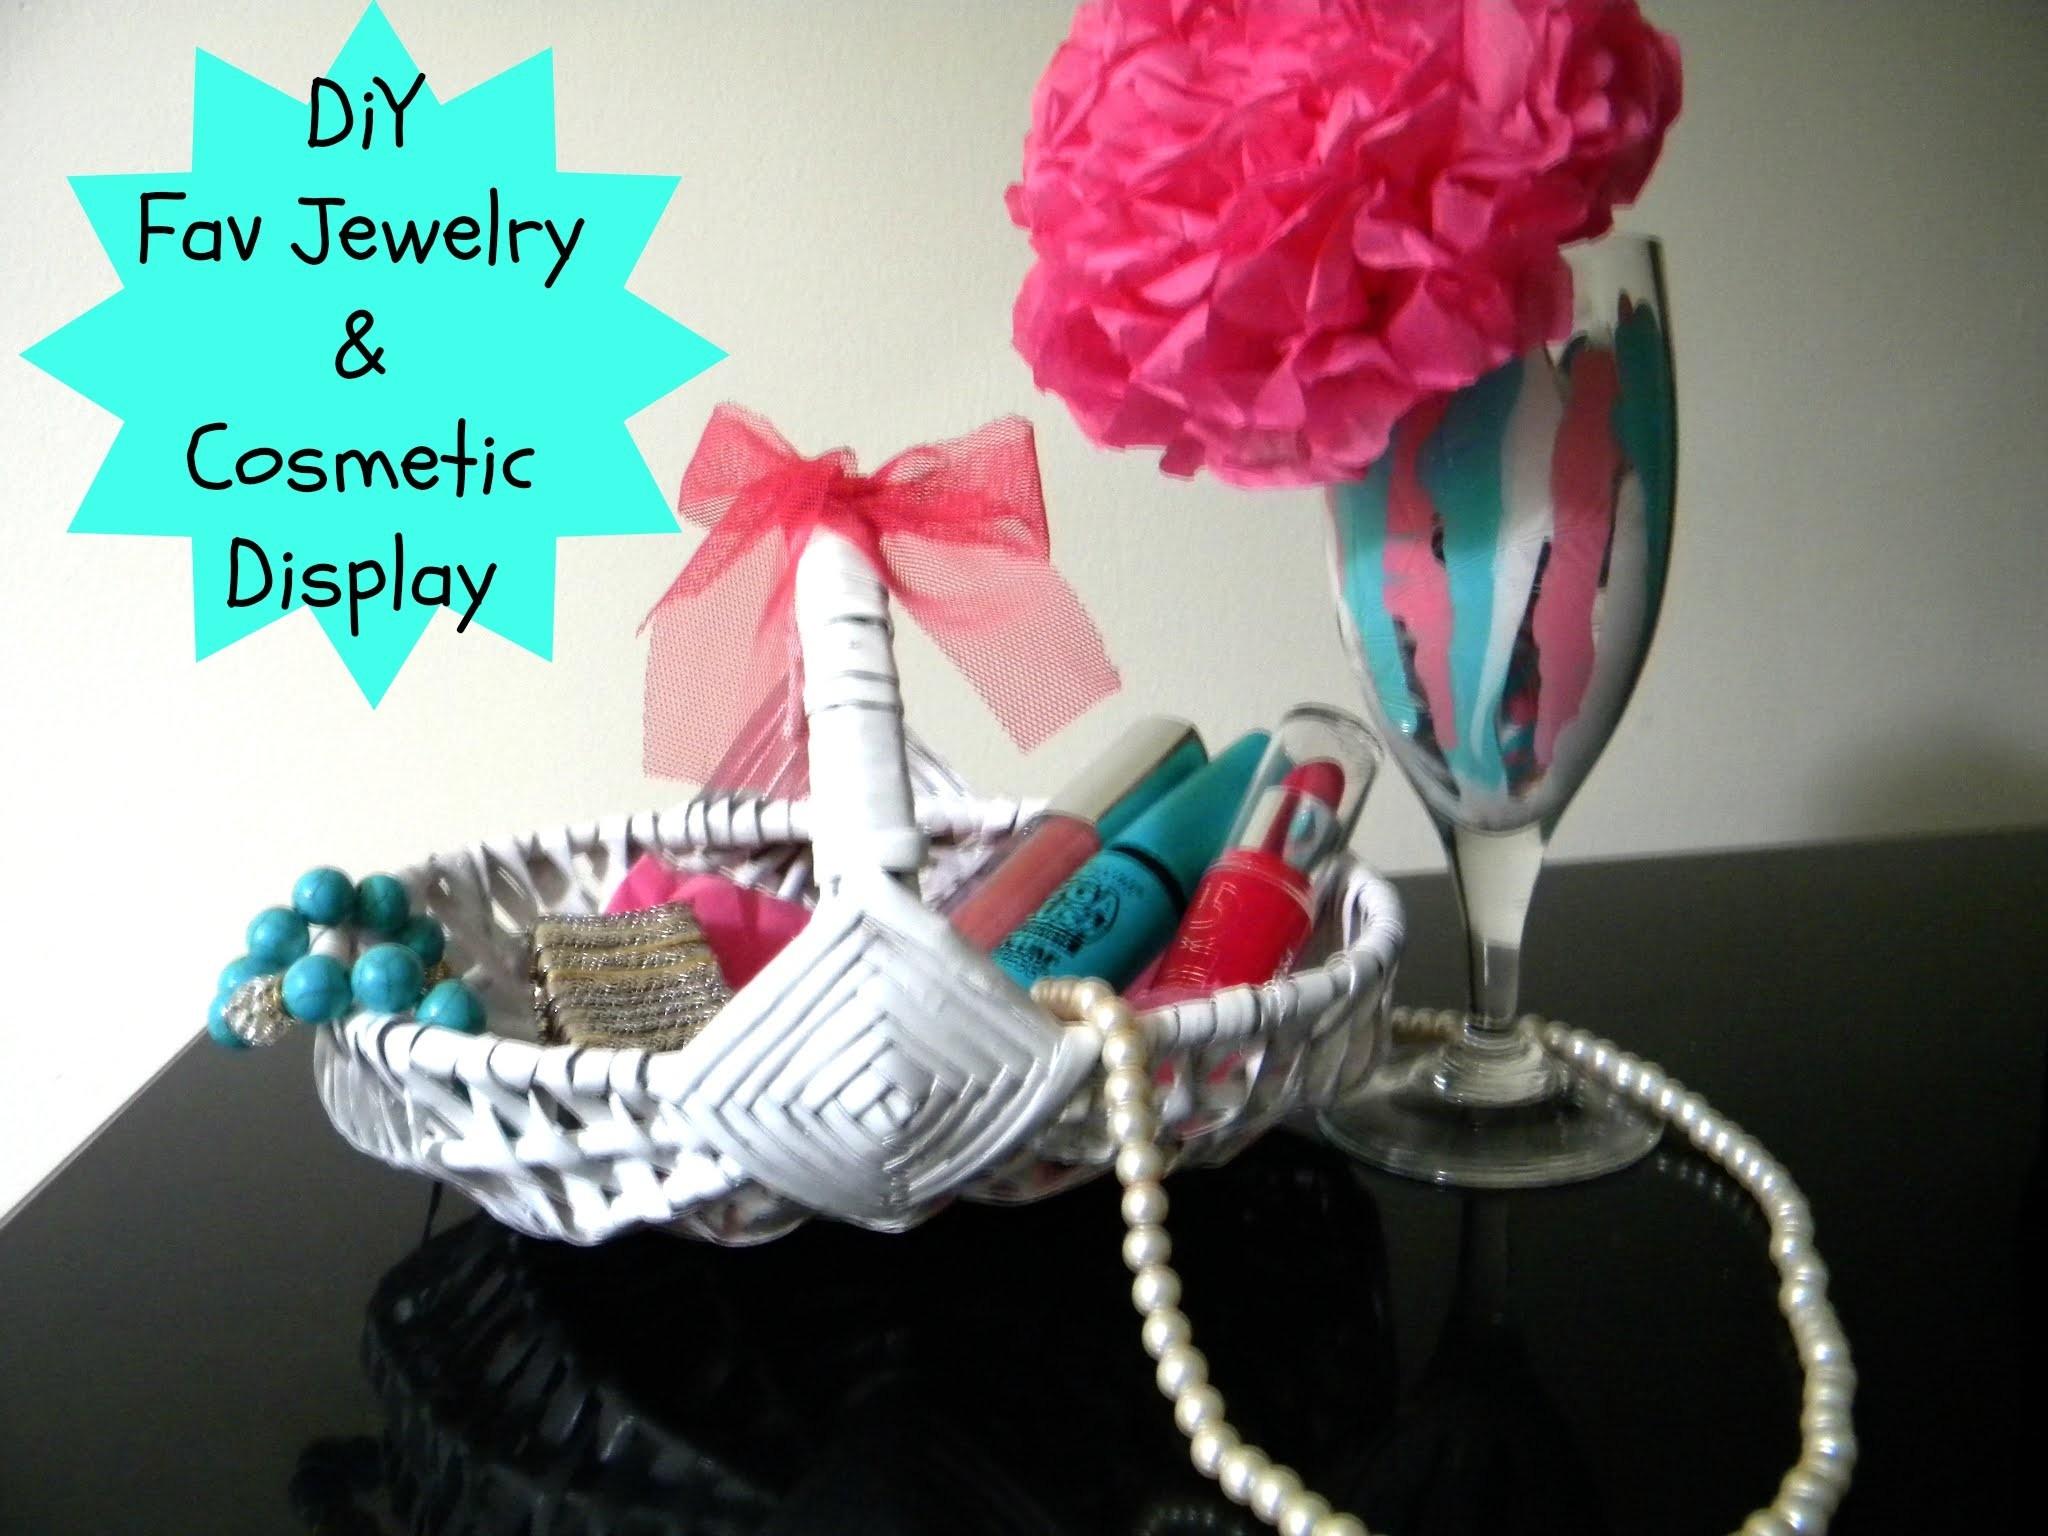 DIY Fav Jewelry & Cosmetics Display. Wine glass decor